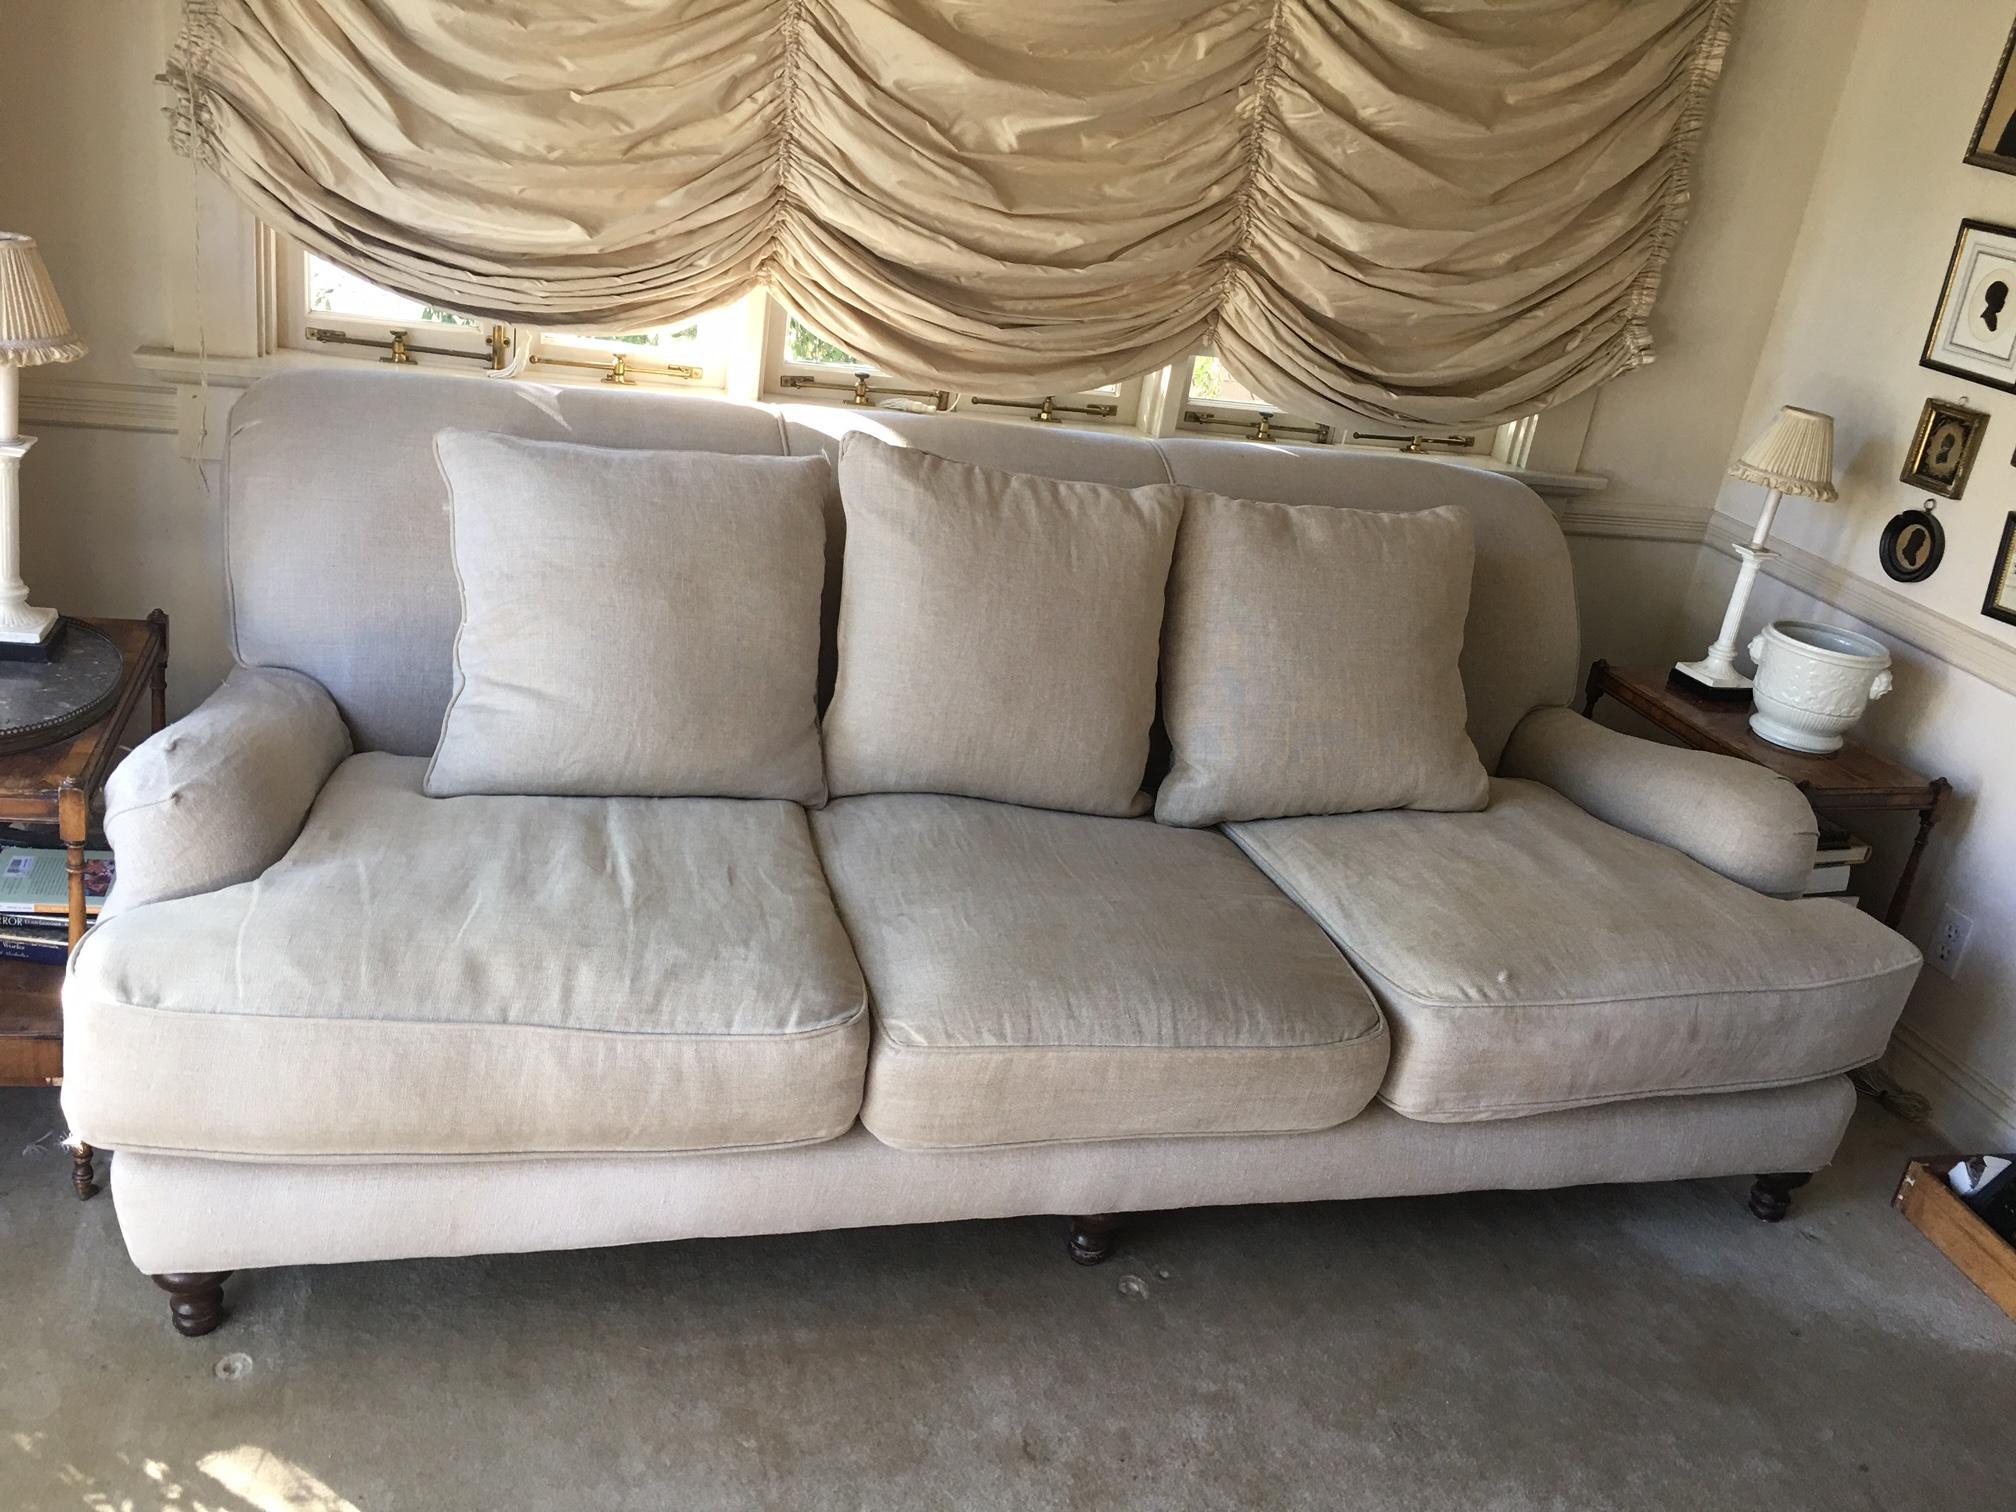 restoration hardware sectional sofa linen venetian worldwide mancora microfiber futon bed in espresso camel sand english roll arm chairish contemporary for sale image 3 of 5